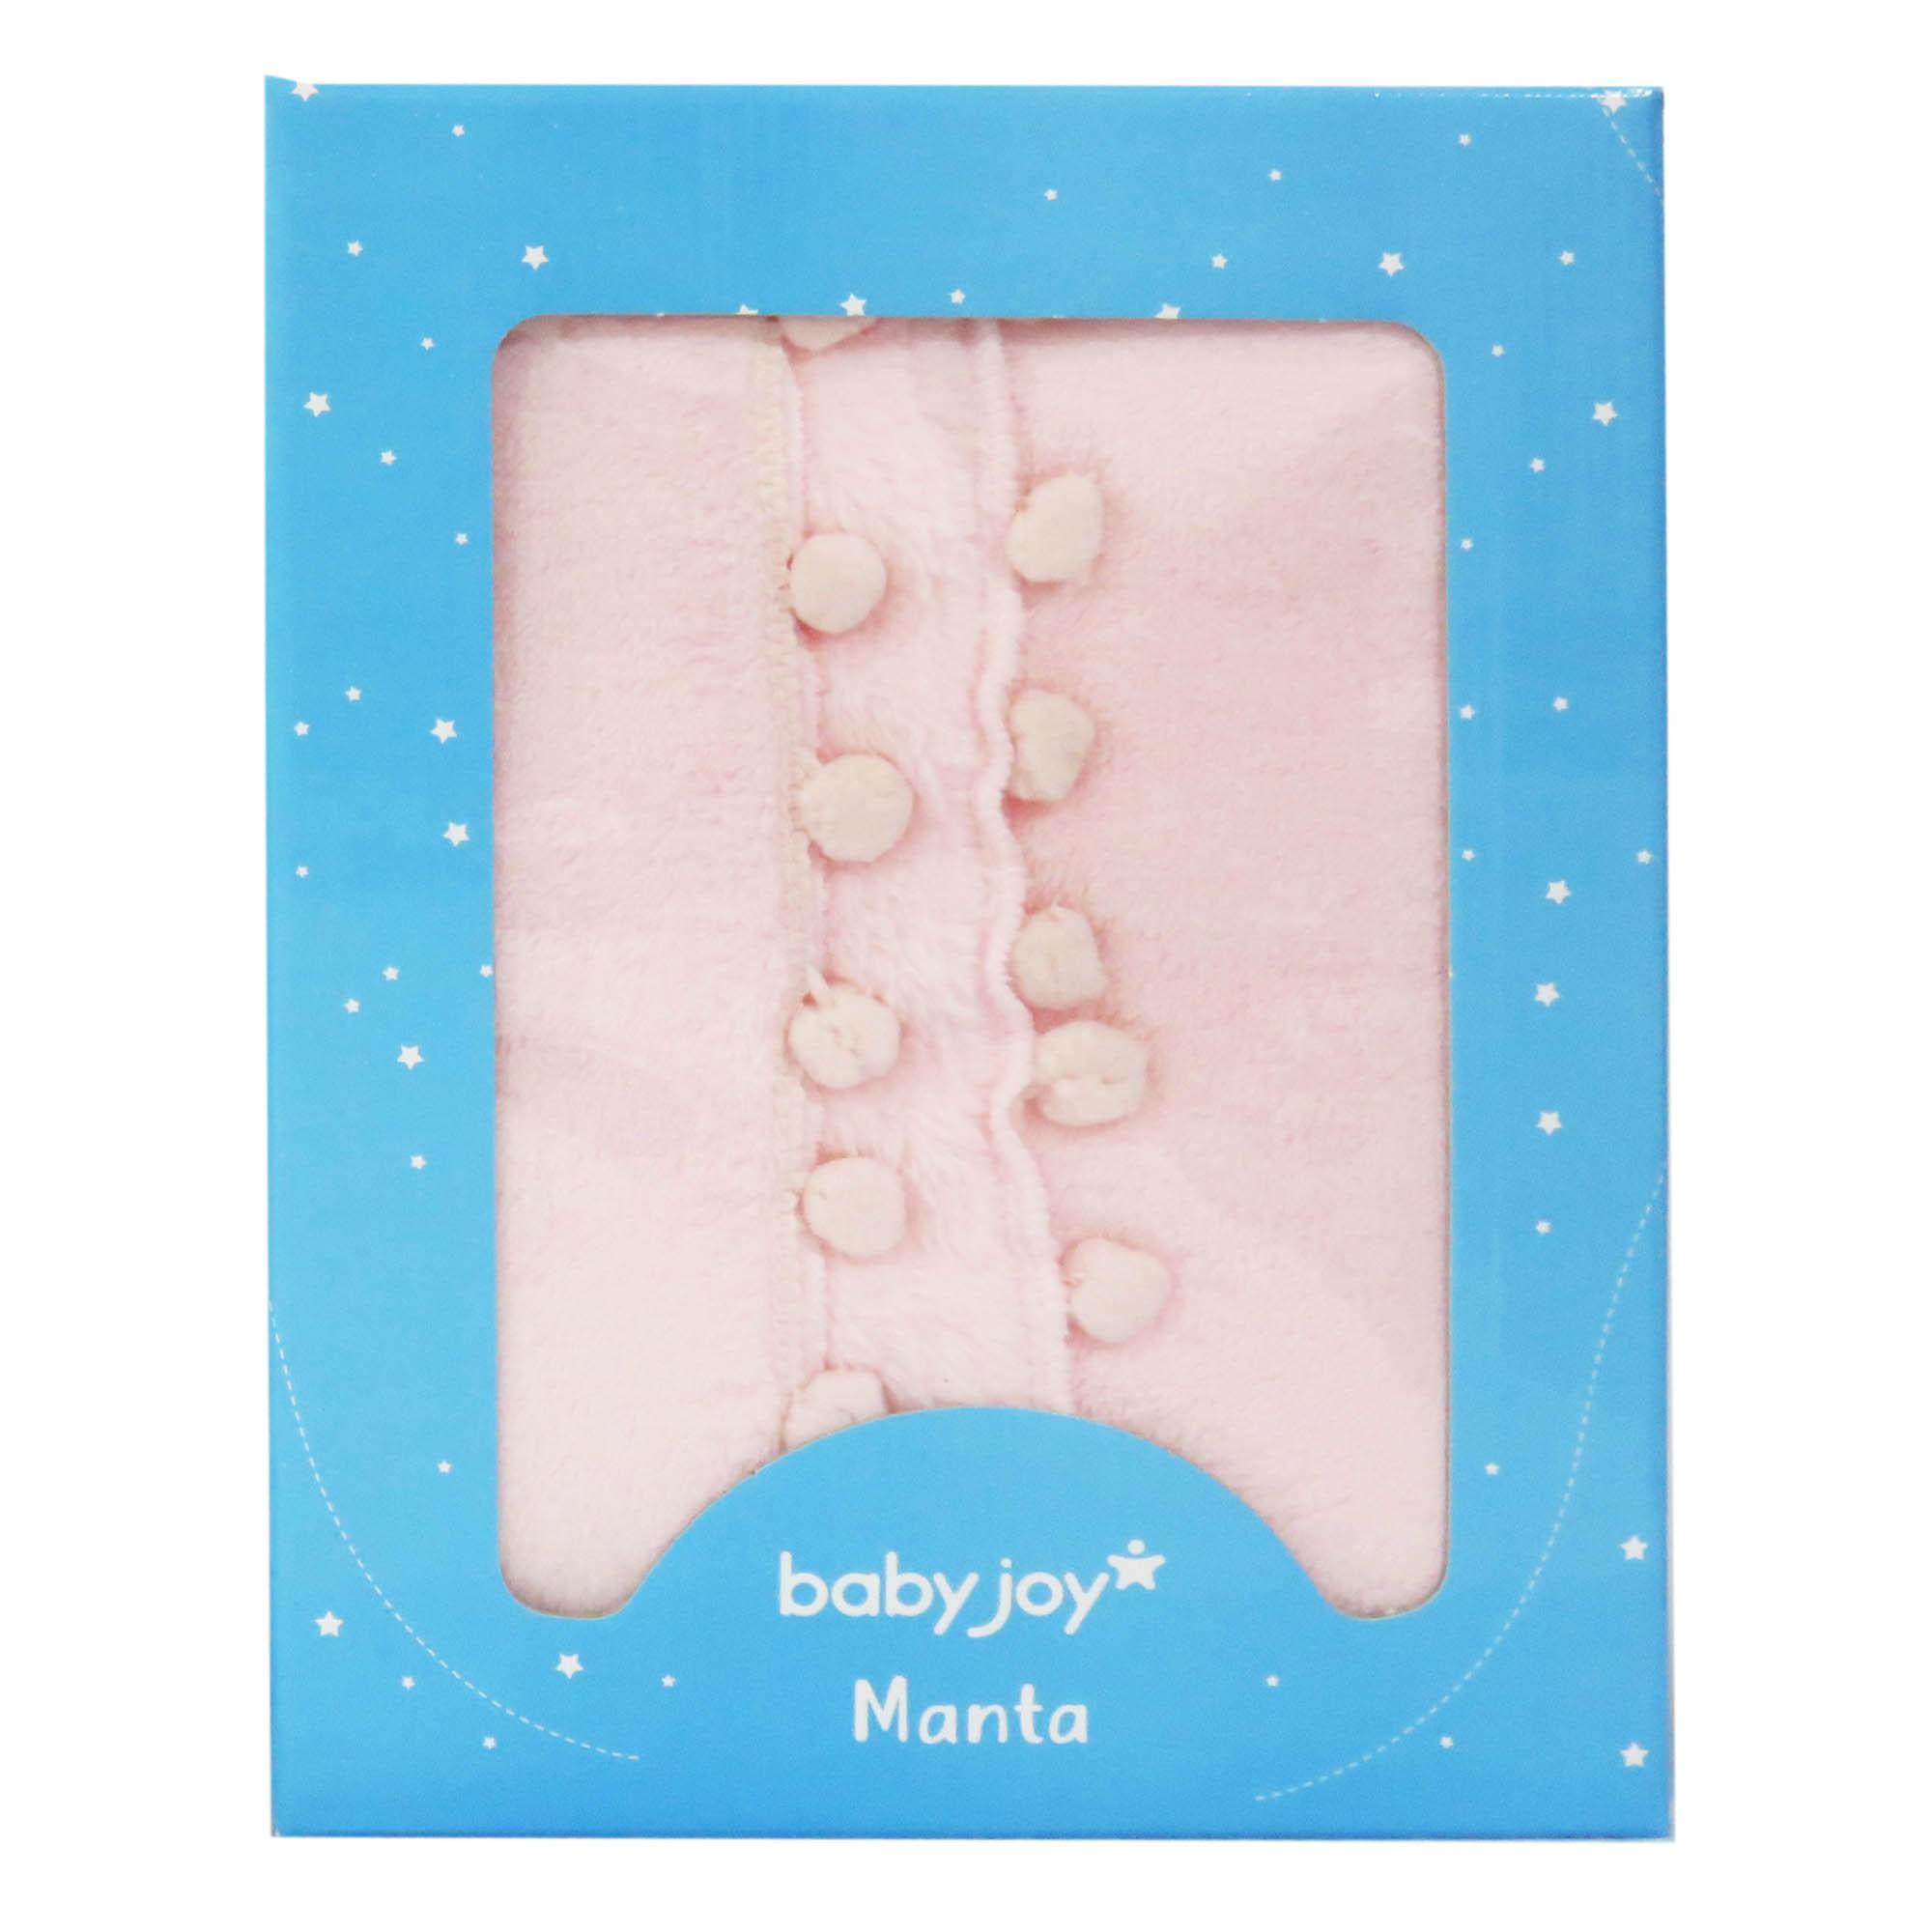 Manta Soft Microfibra Pompons - Incomfral - Babyjoy